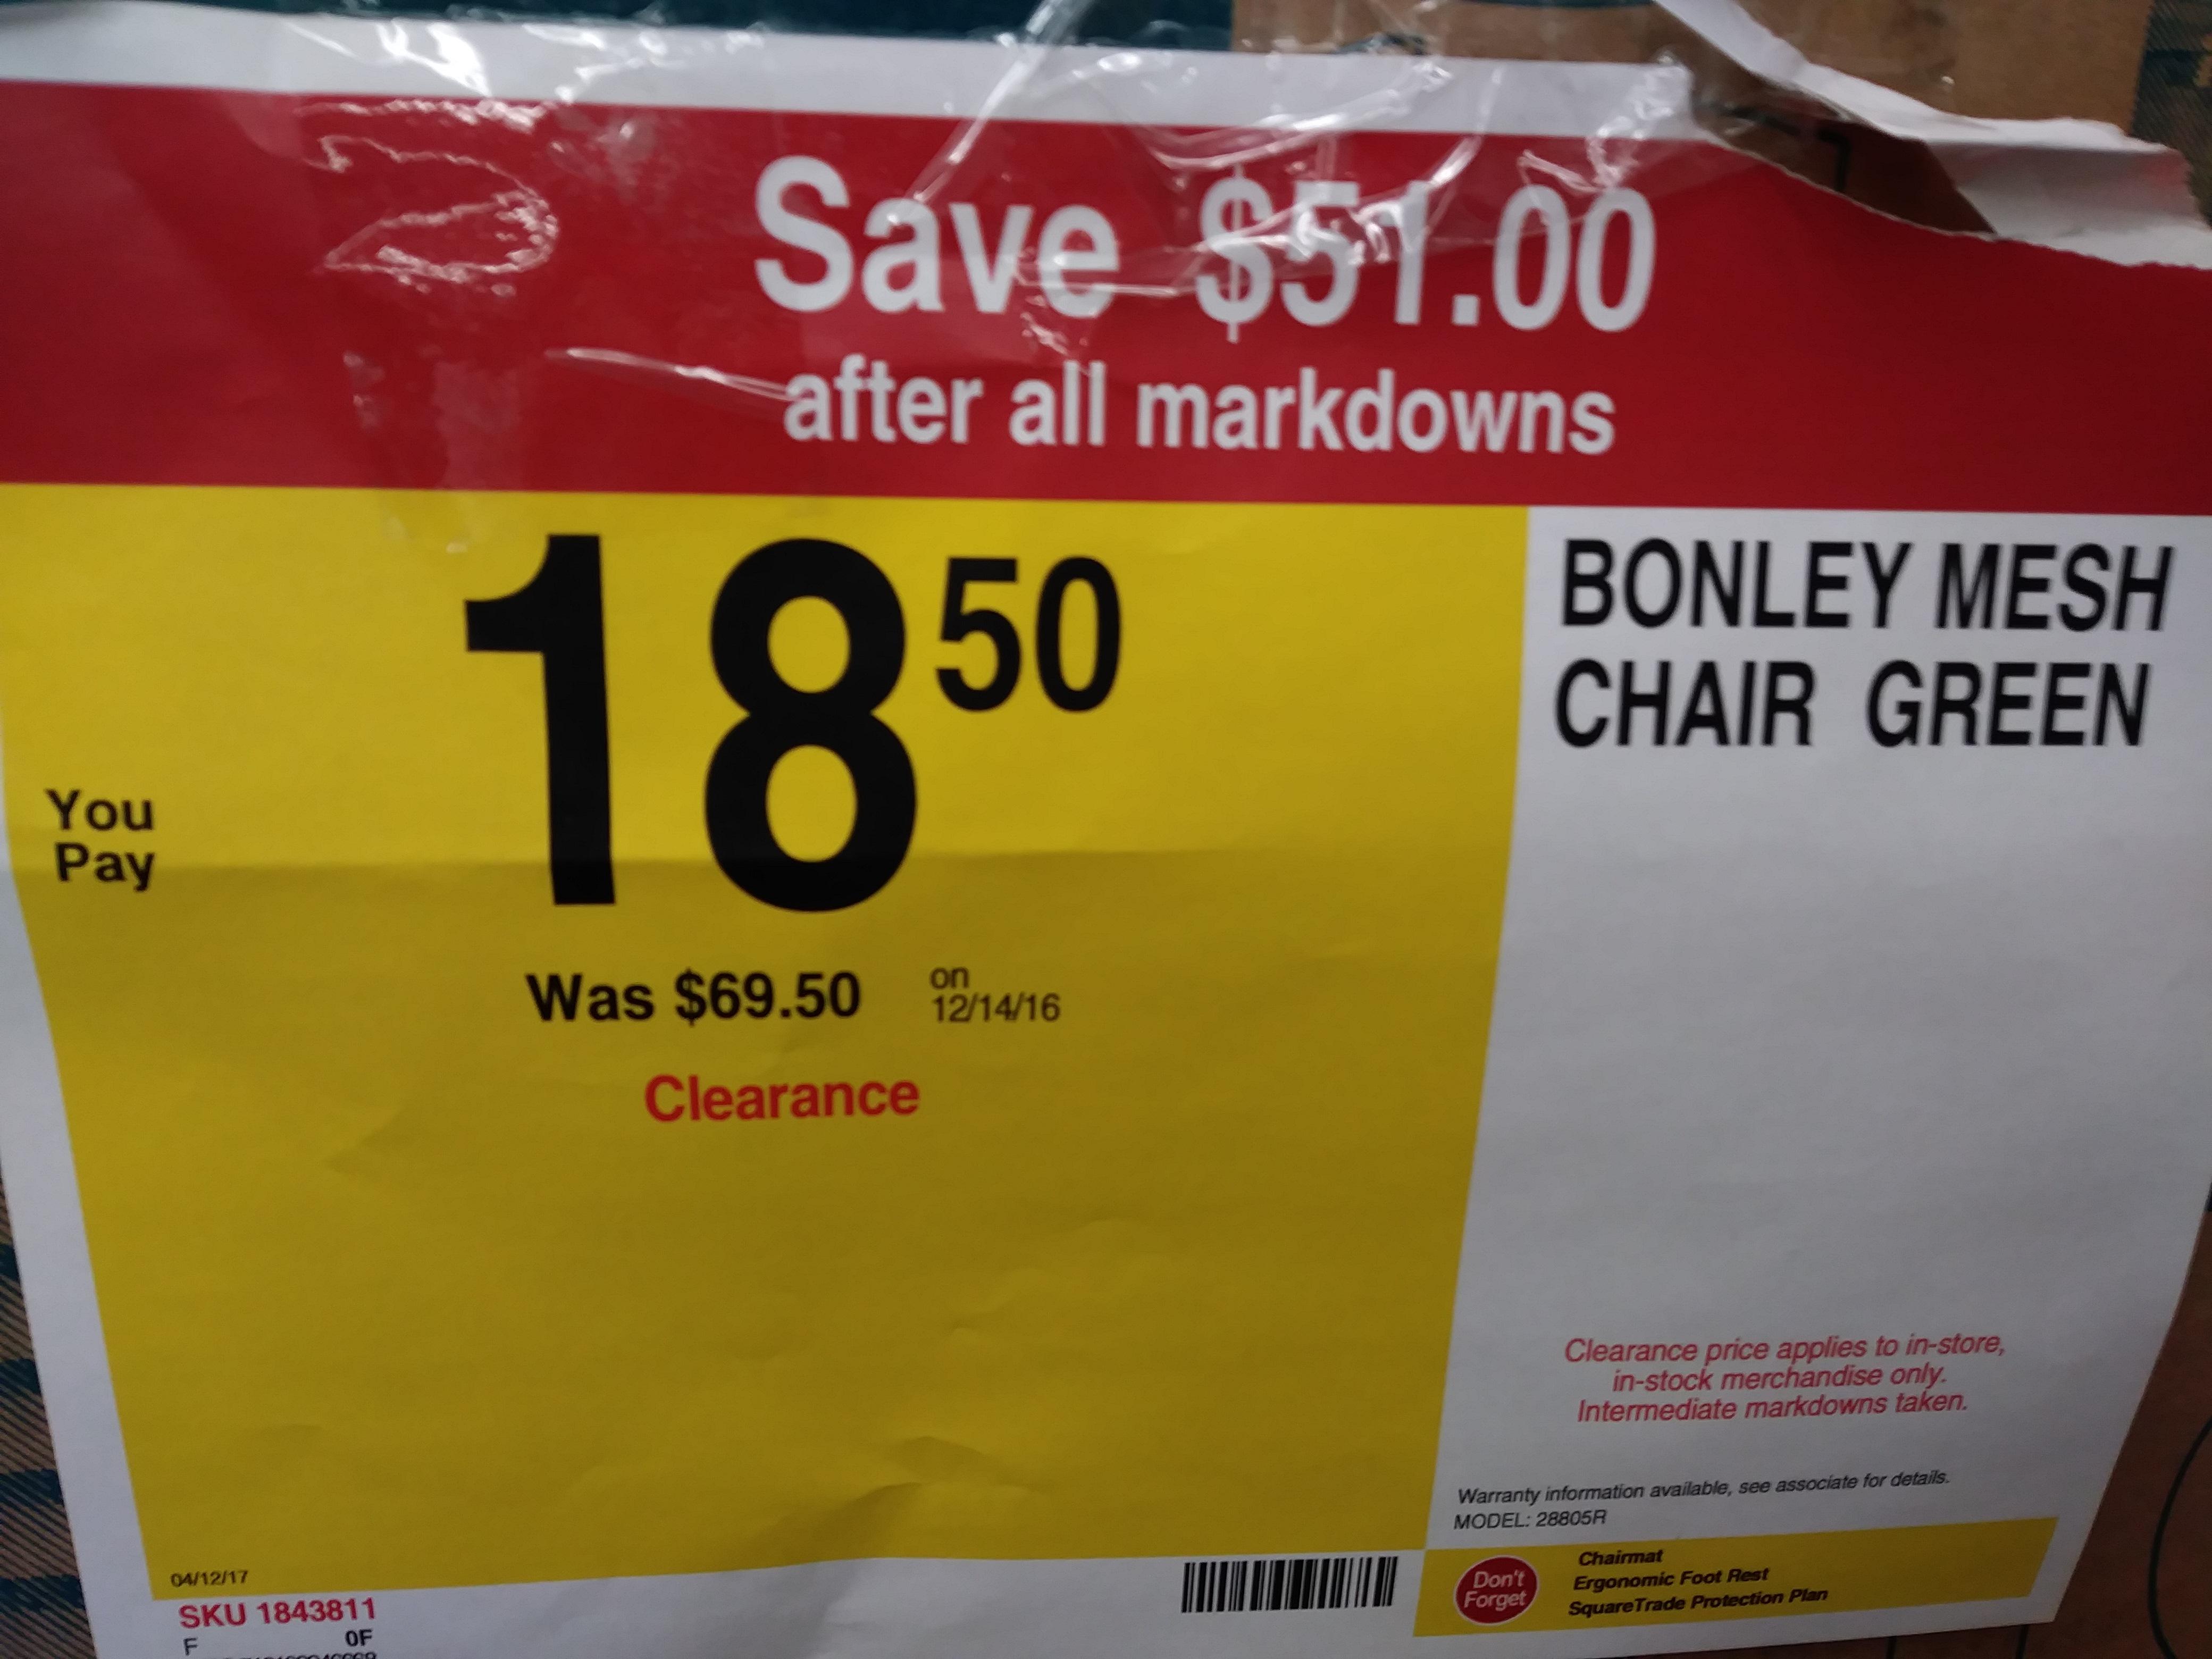 Staples® Bonley Mesh Chair, Green - $18.50 (YMMV)